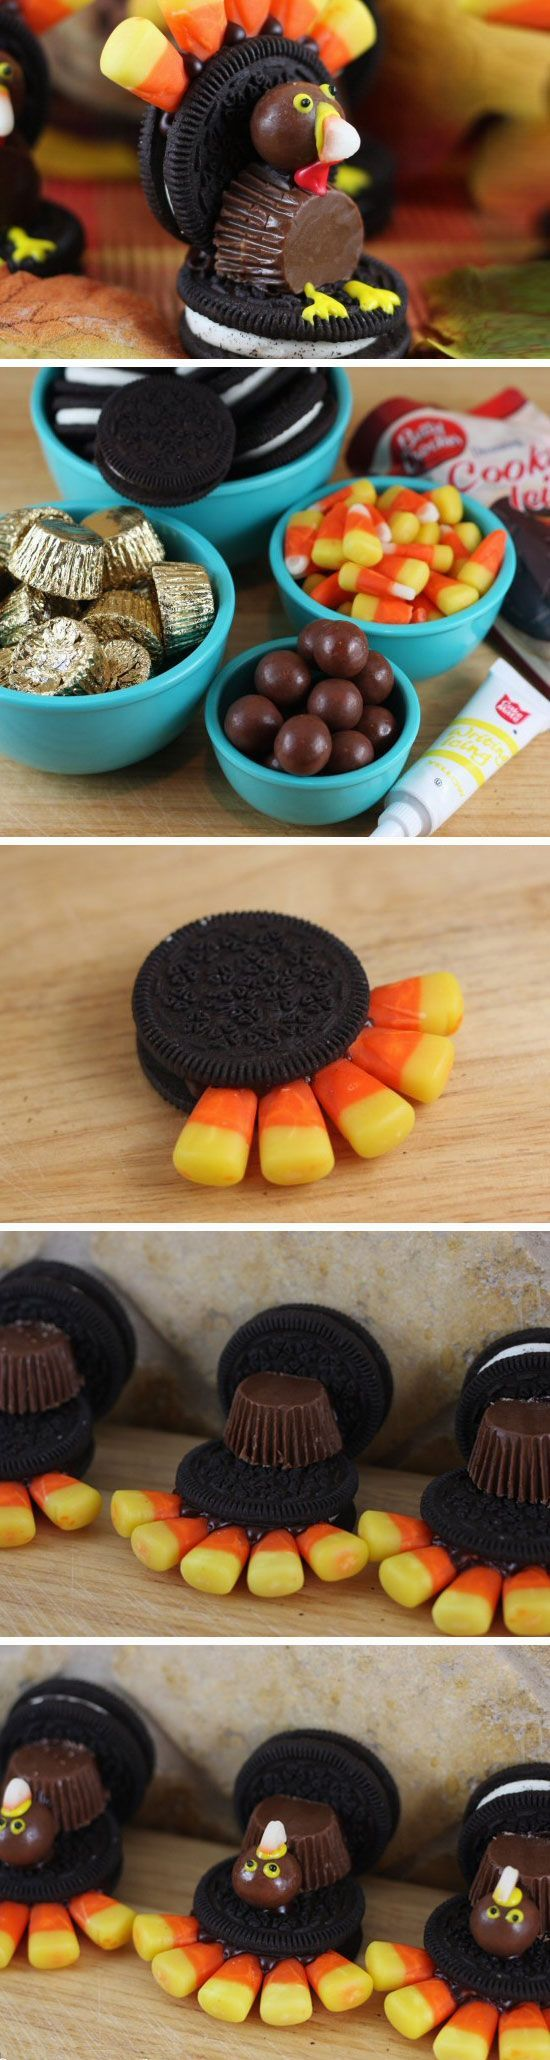 Oreo Turkeys Easy Thanksgiving Desserts Recipes for Kids   Easy Fall Treats for Kids to Make